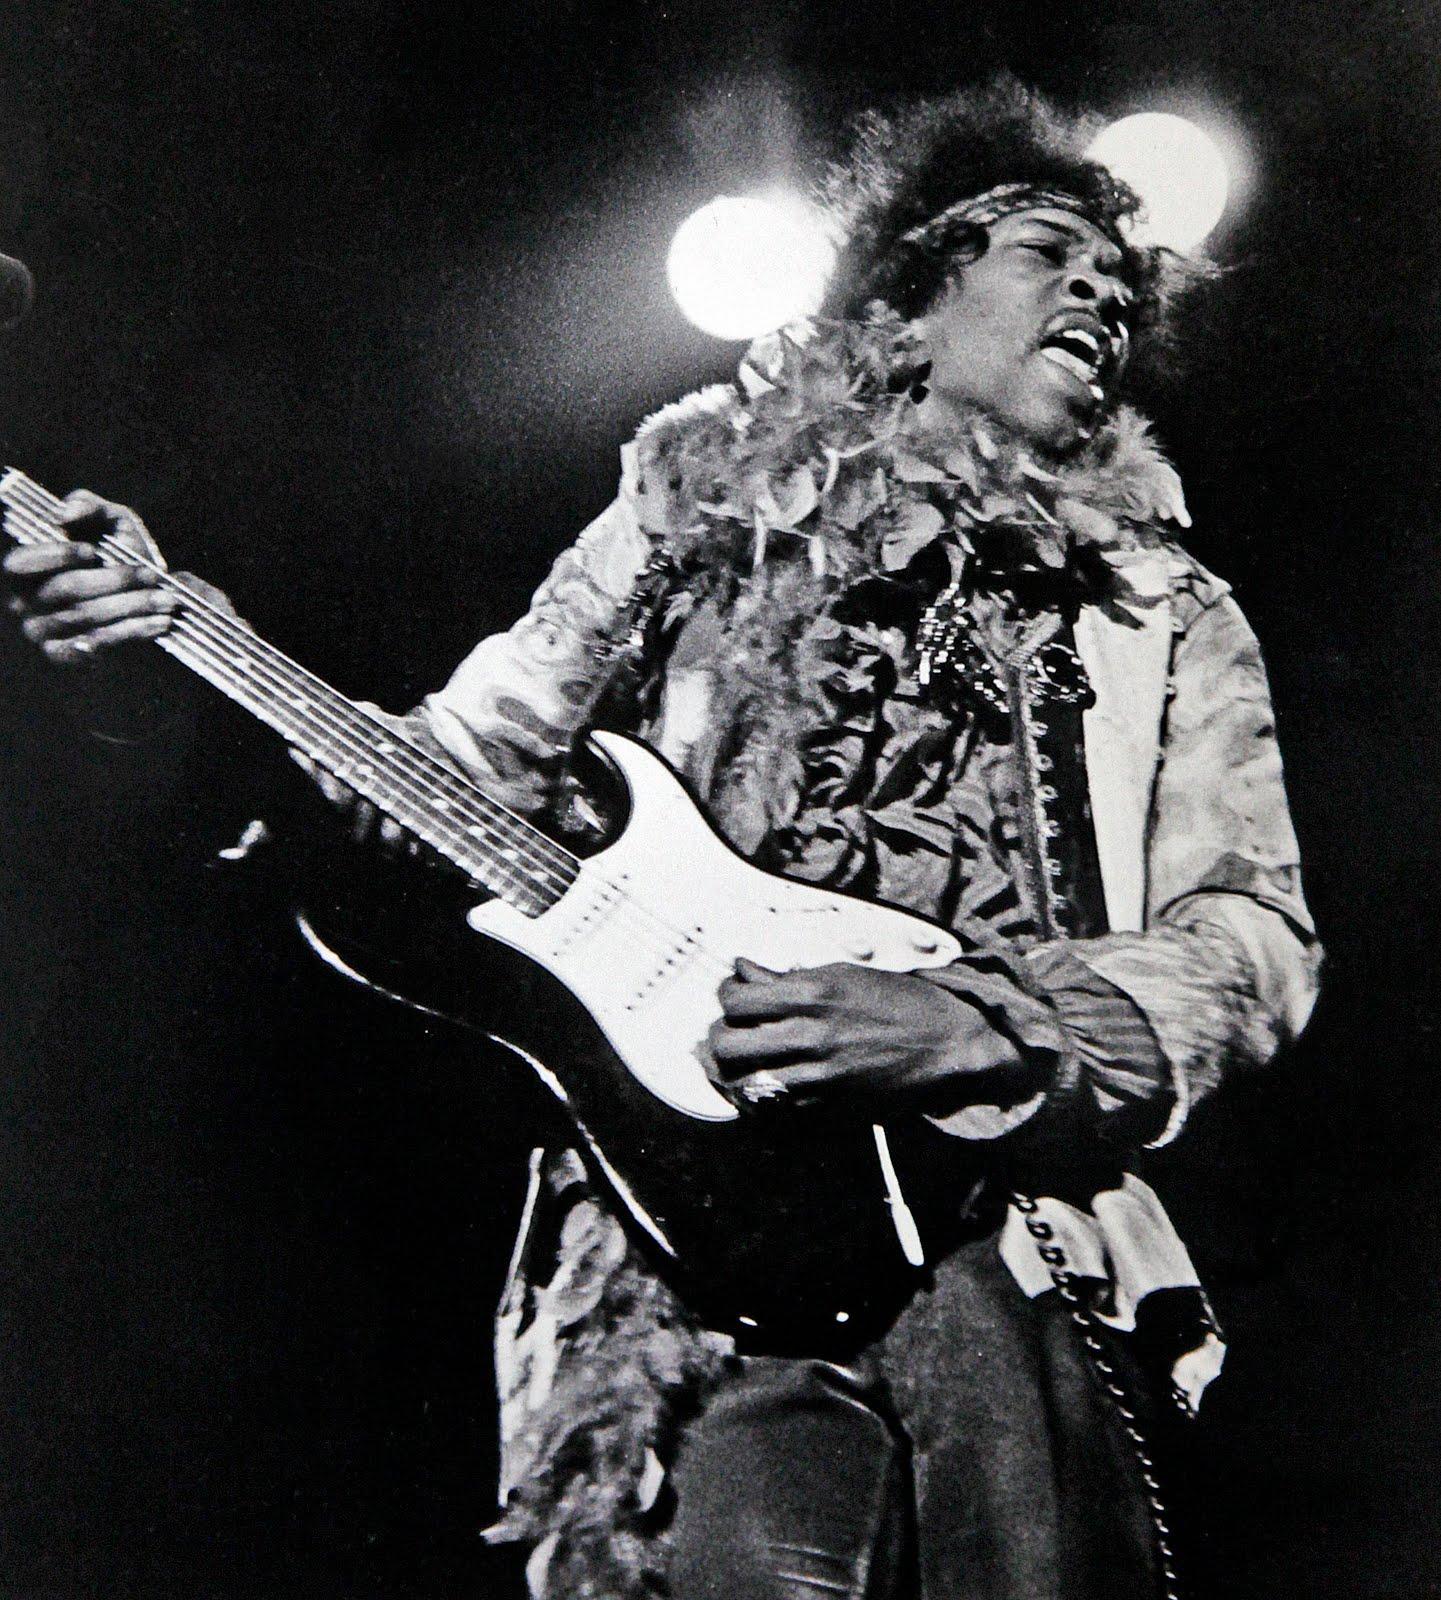 Live At Monterey (2007) 5384ef3eb9b0598498a8852d9f6fb772